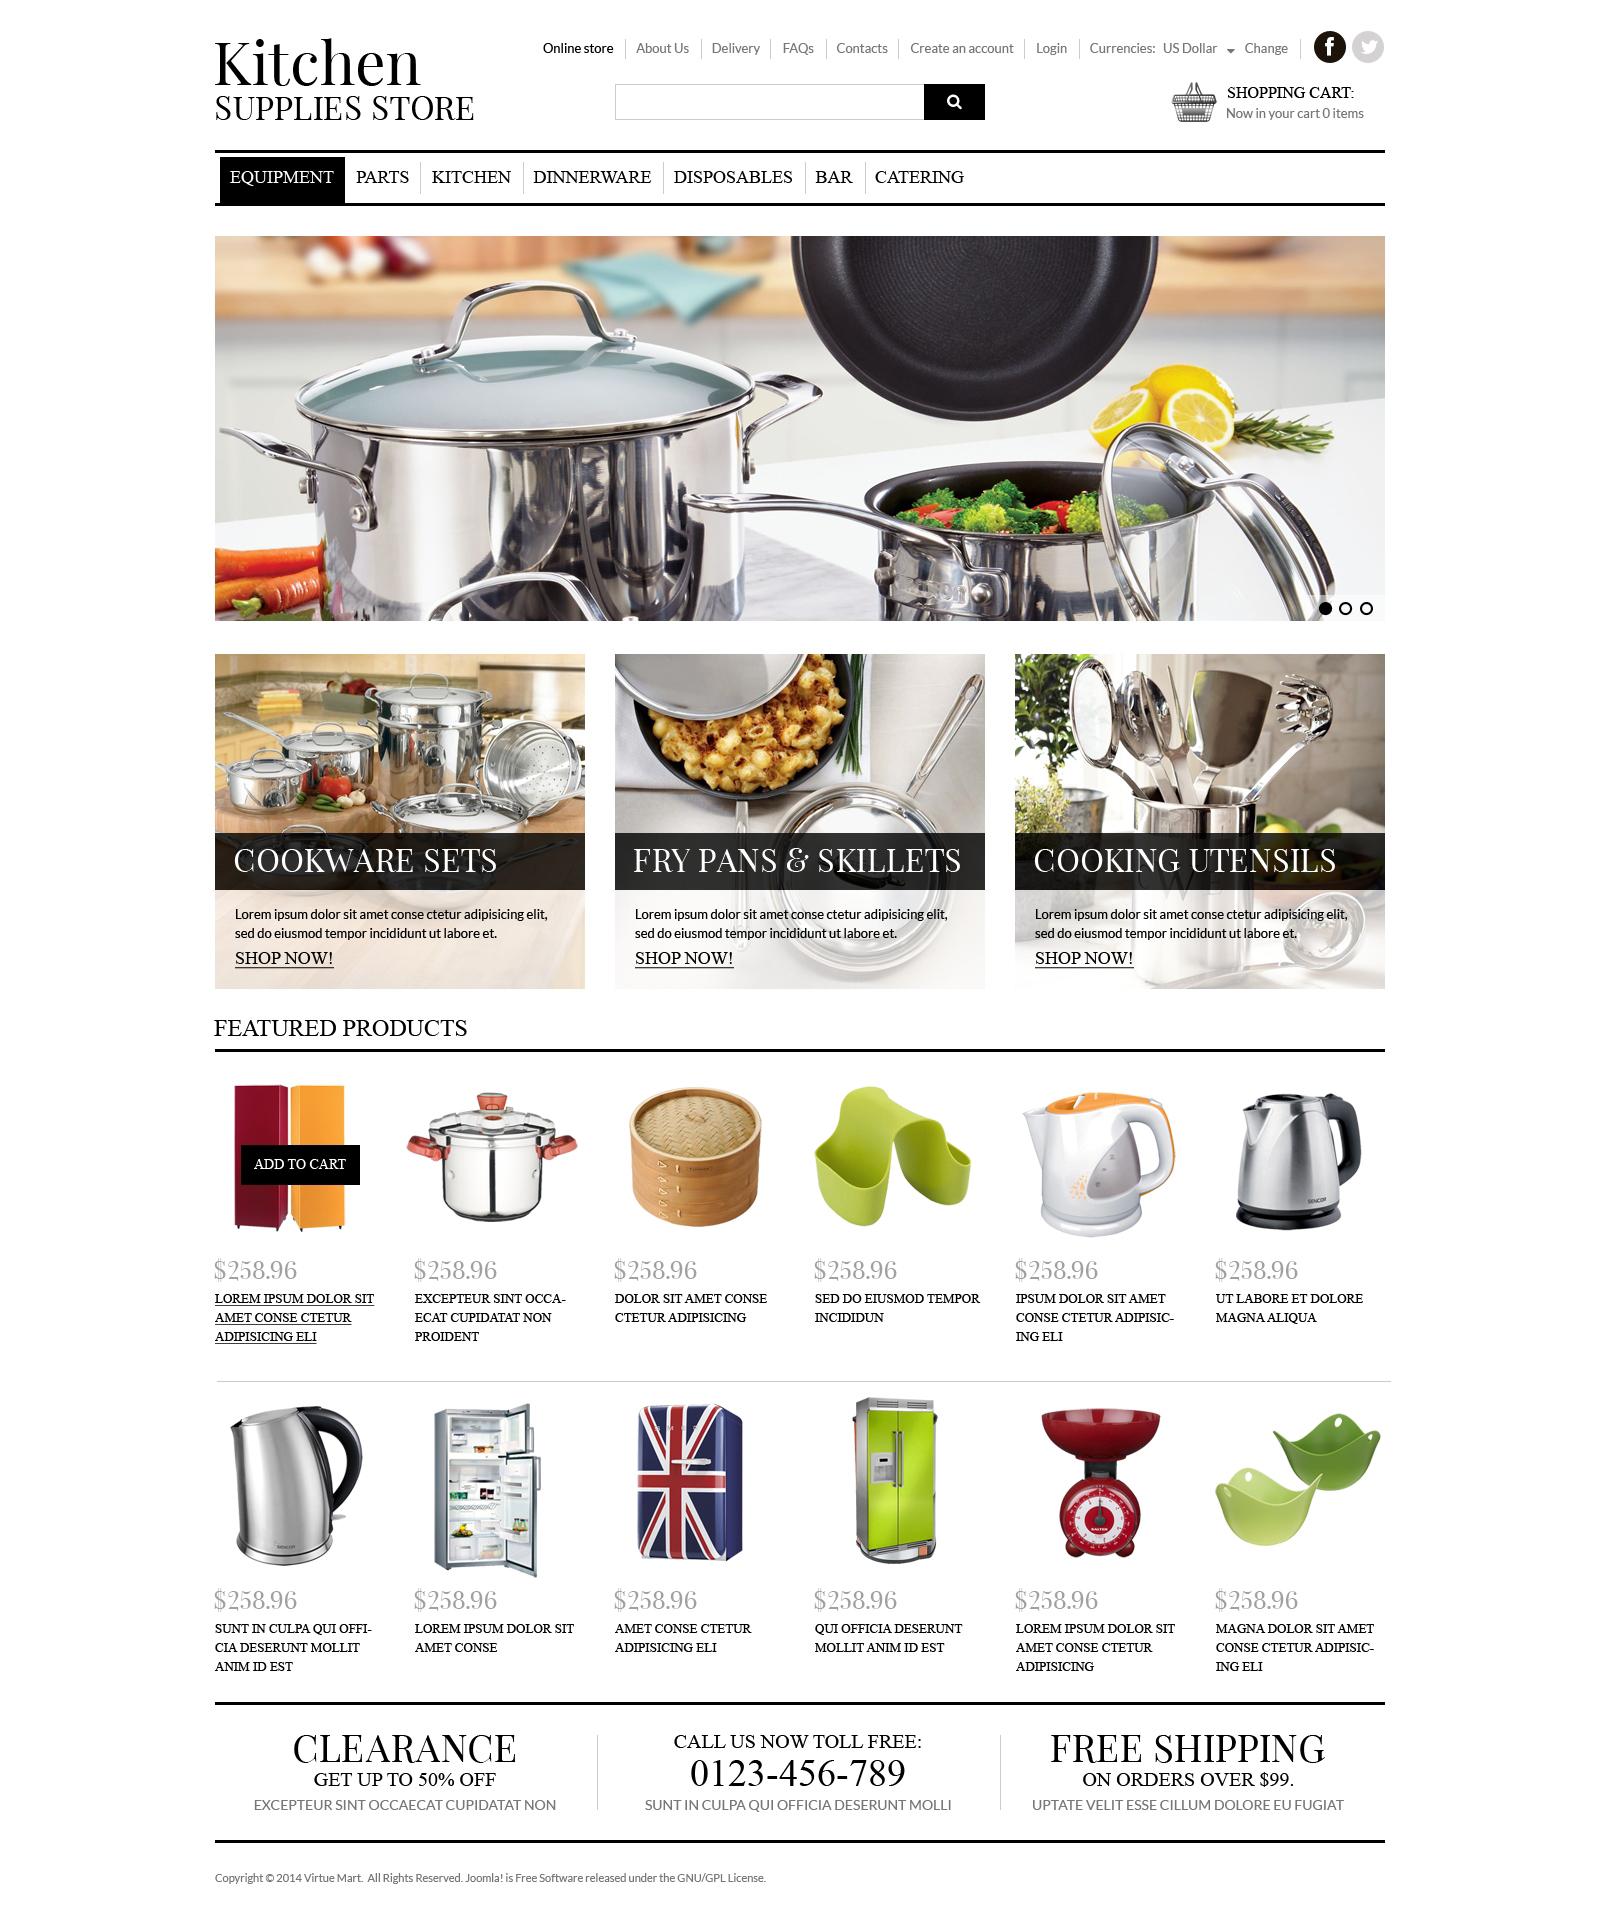 Template VirtueMart para Sites de Utilidades Domésticas №50914